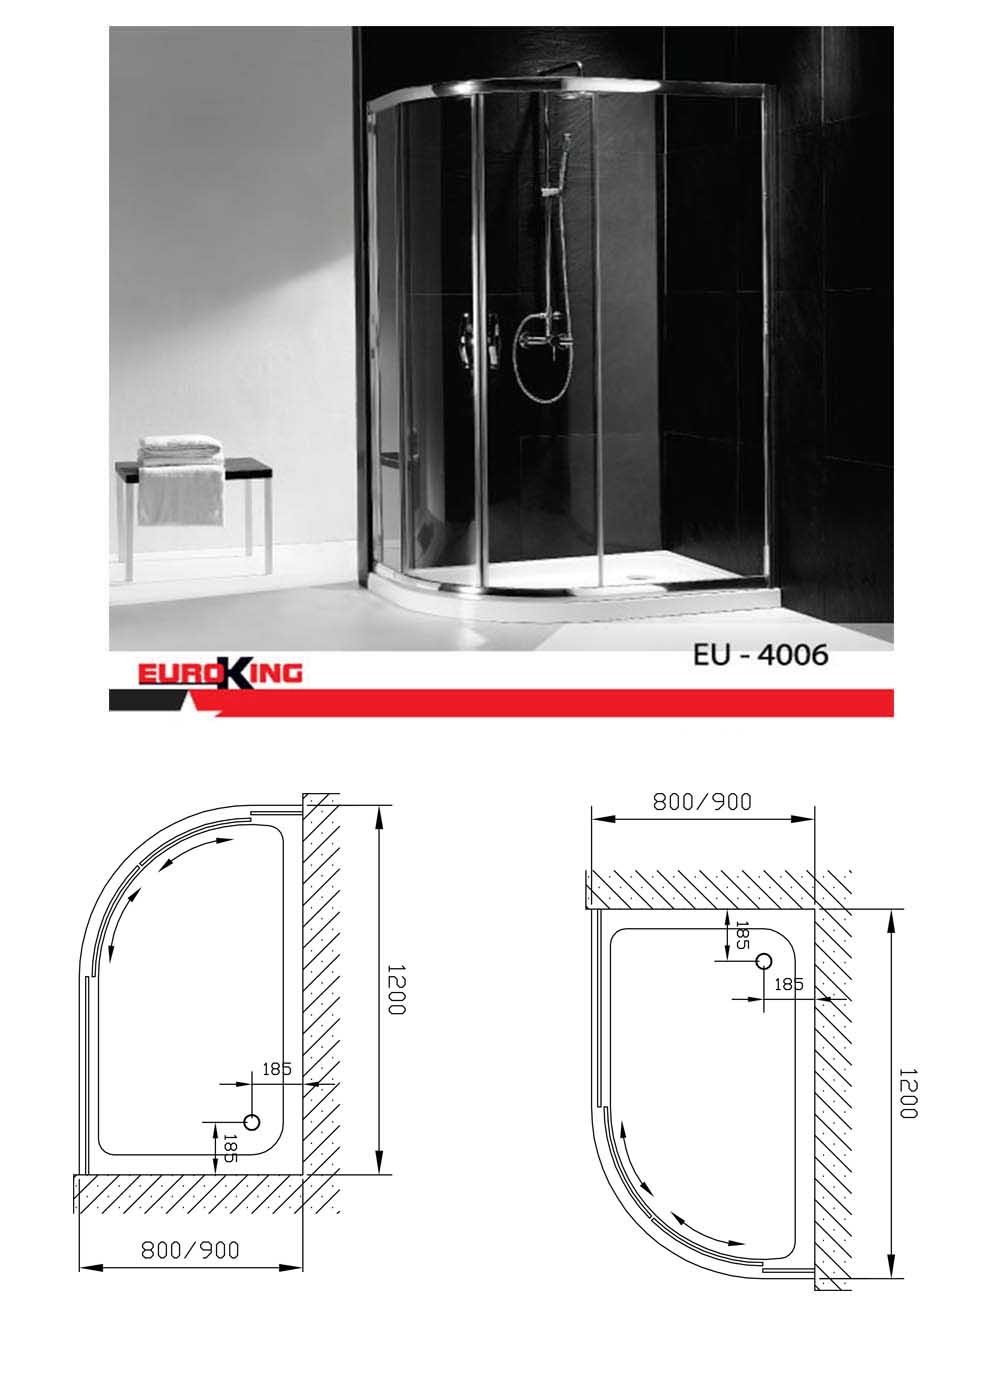 Bảng vẽ kỹ thuật EU-4006